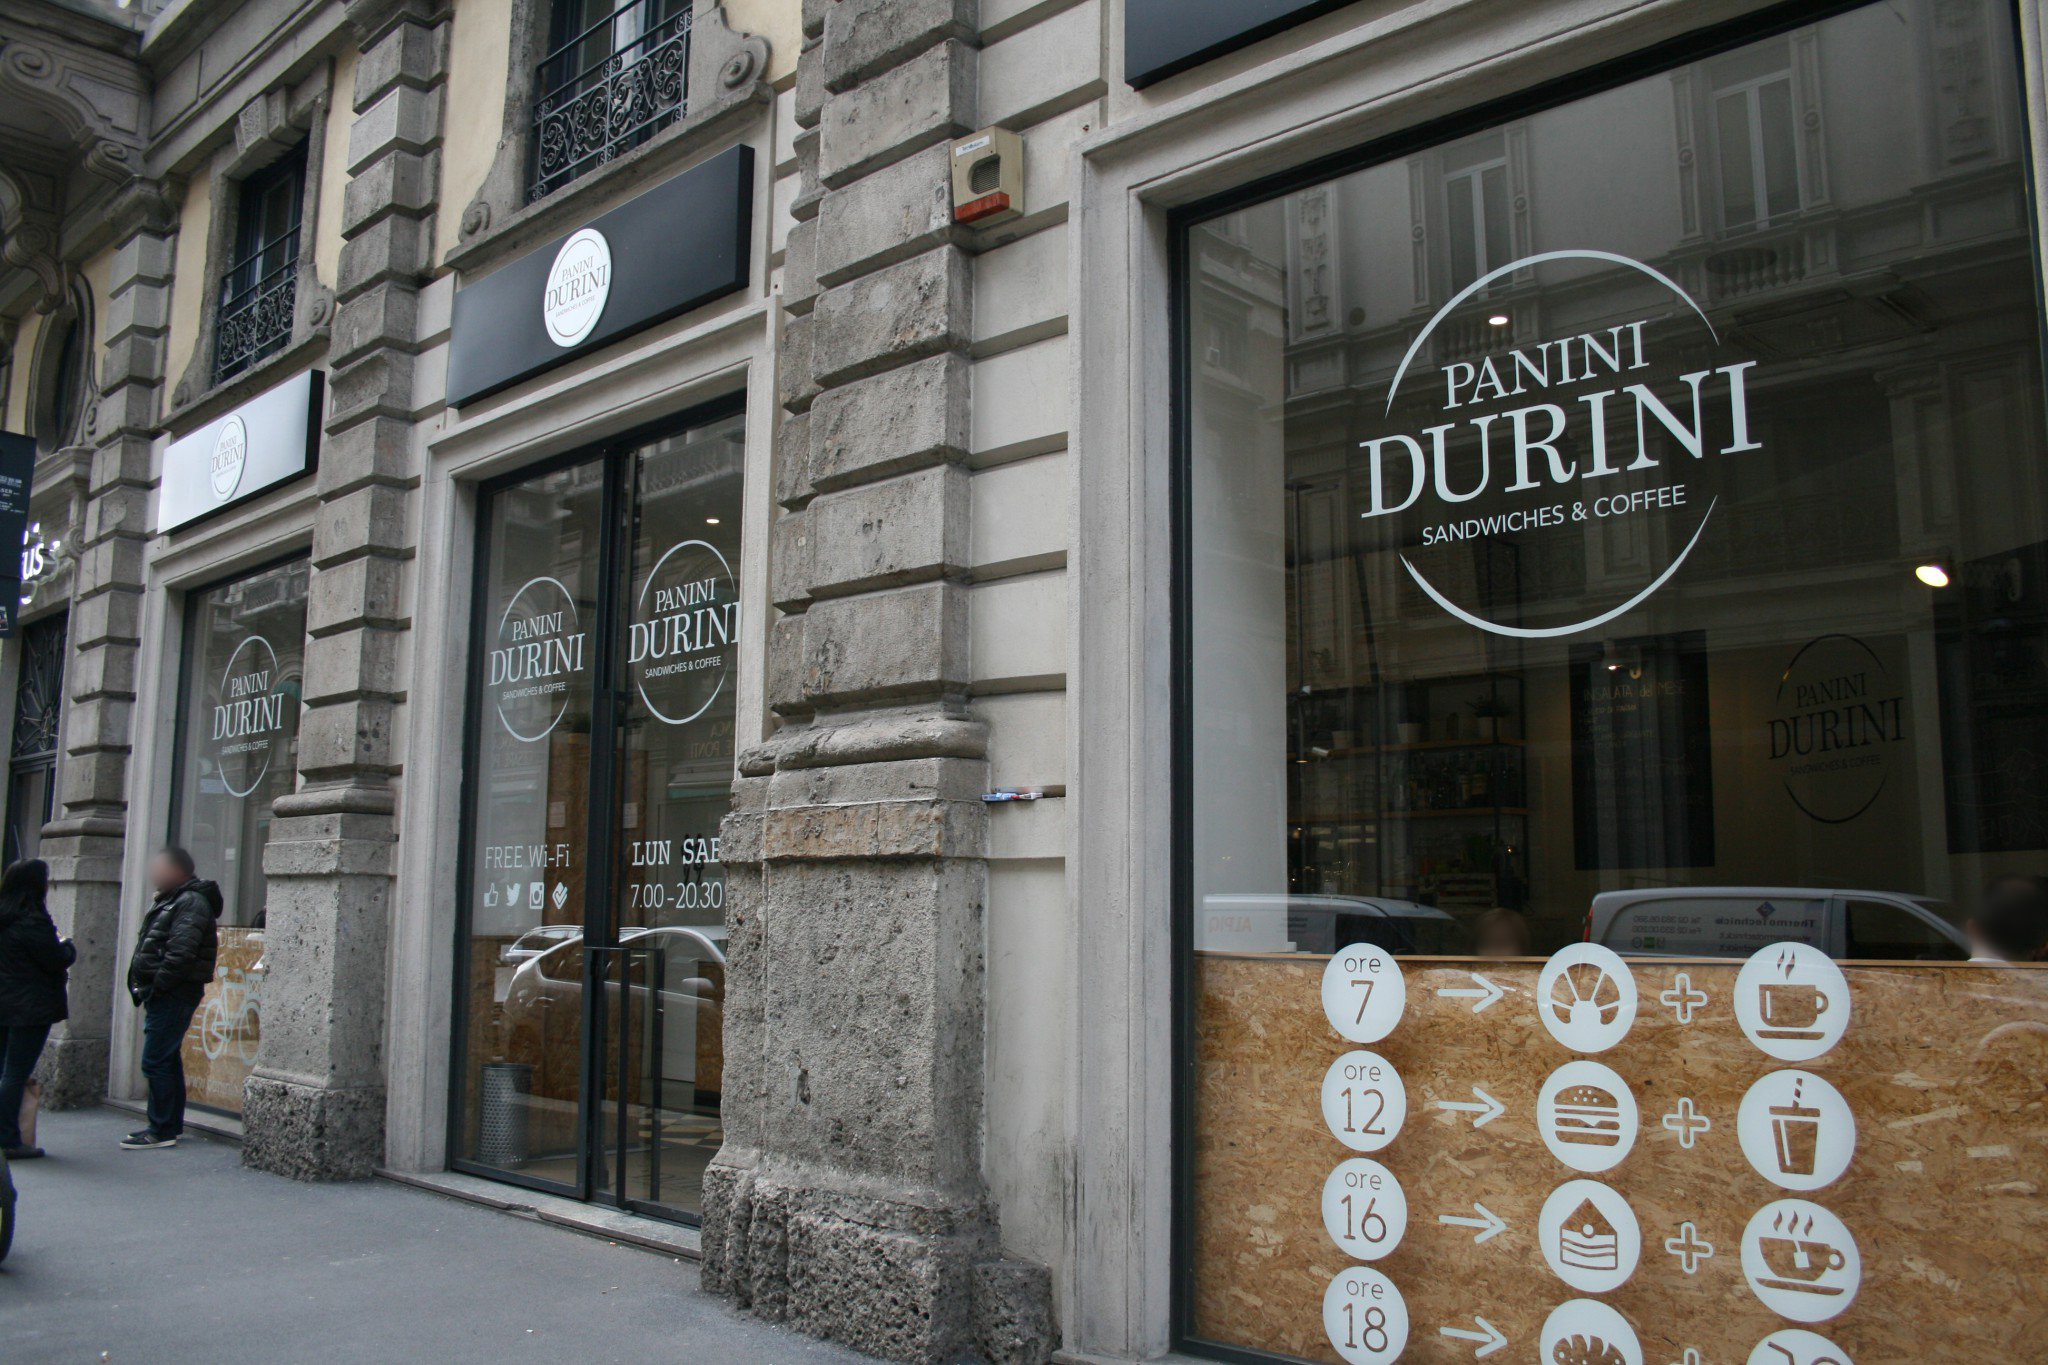 Panini durini via giuseppe mengoni 4 mi icm for Via durini 4 milano